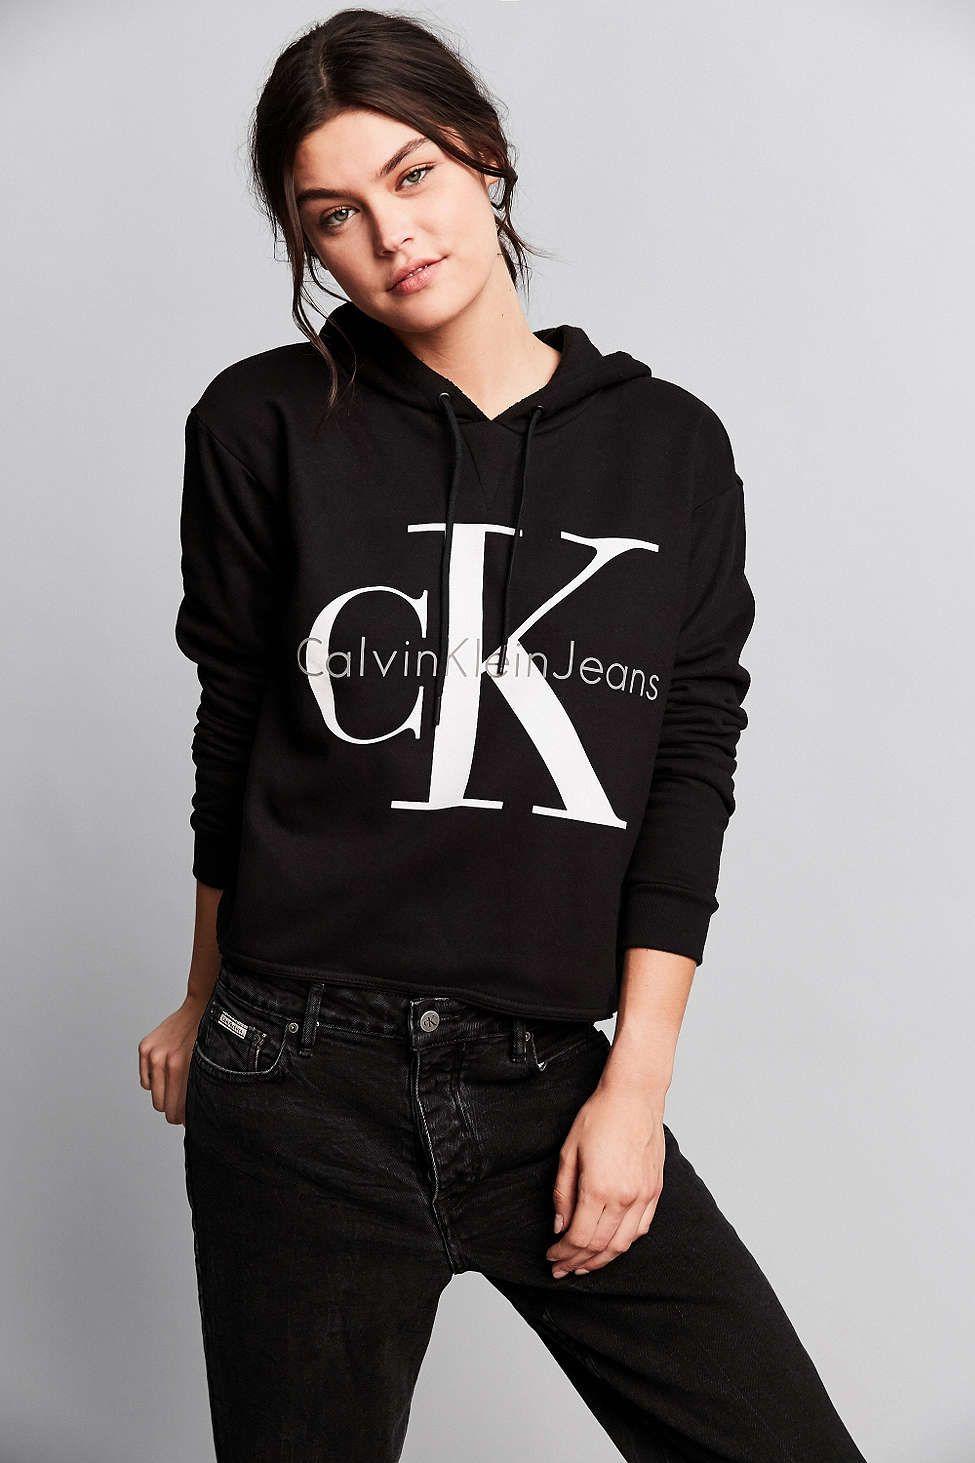 Calvin Klein For UO 90s Cropped Hoodie Sweatshirt - Urban